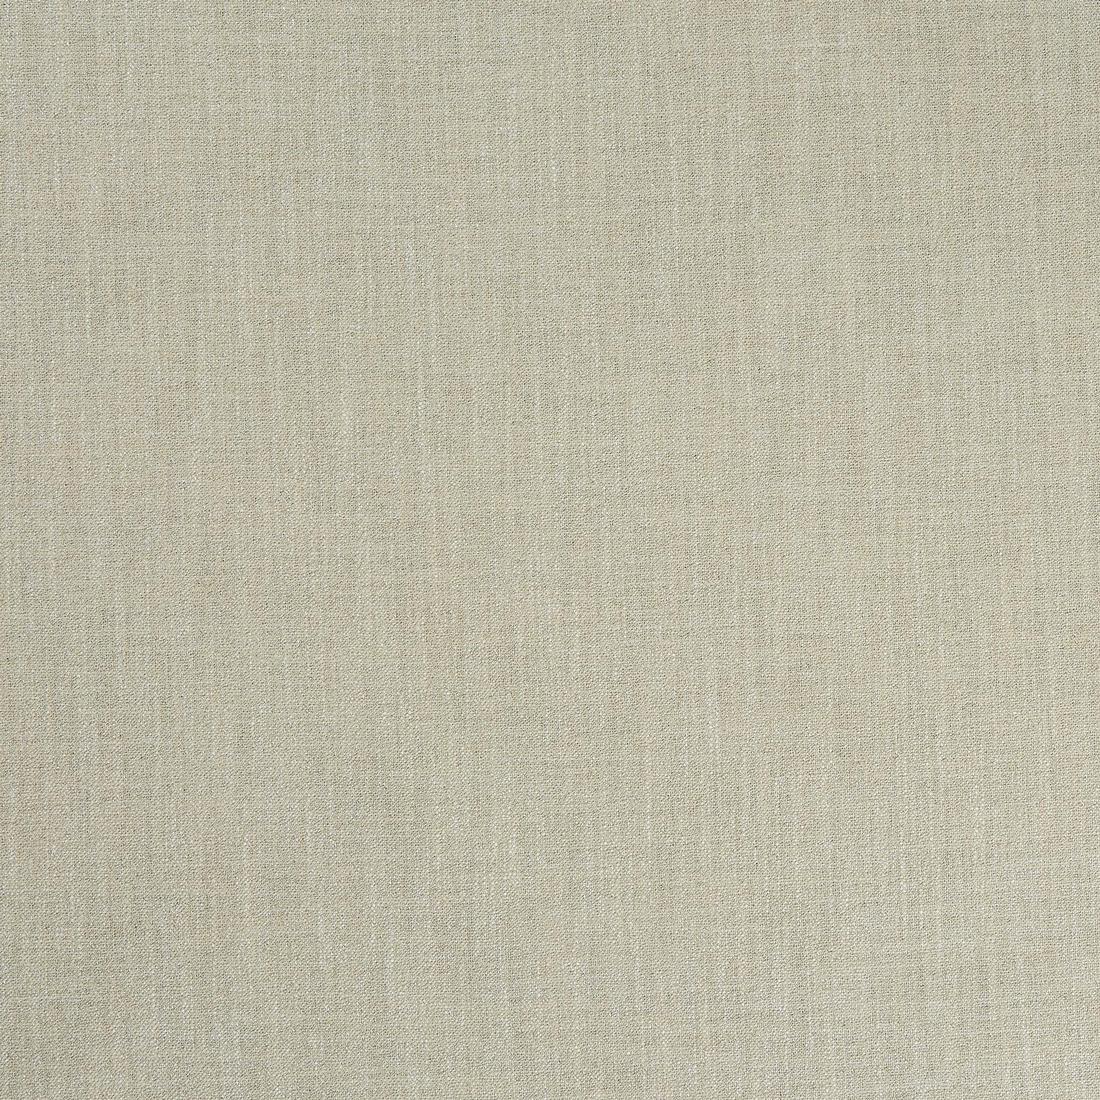 Galaxy Tusk Upholstery Fabric